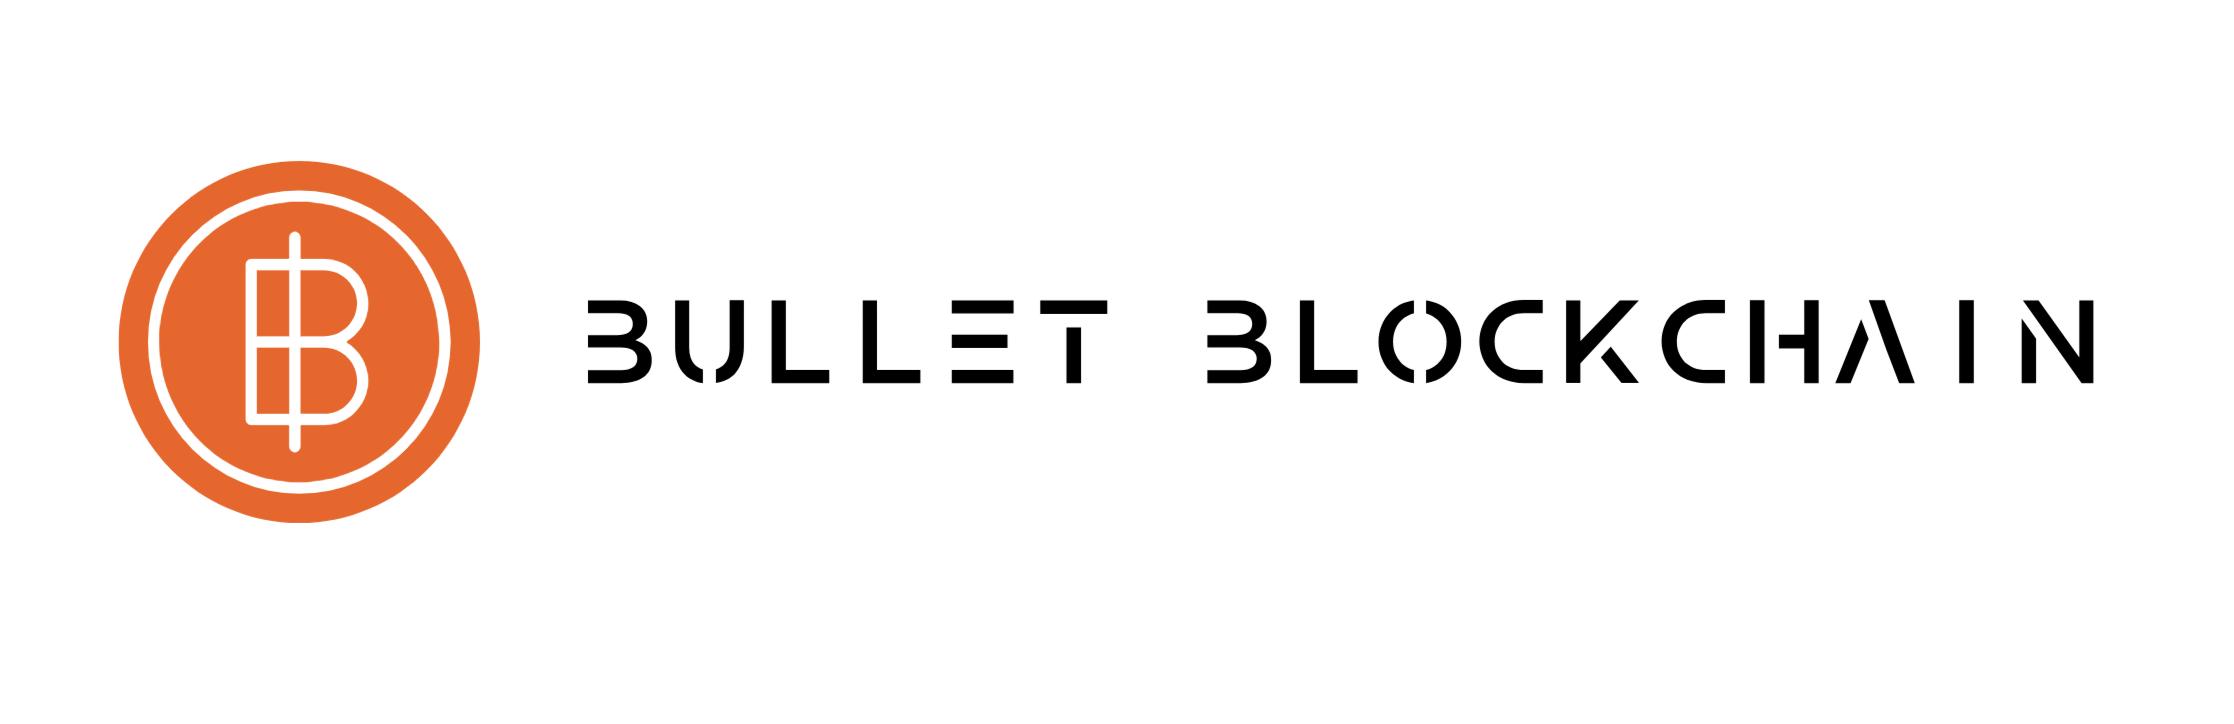 Bullet Blockchain